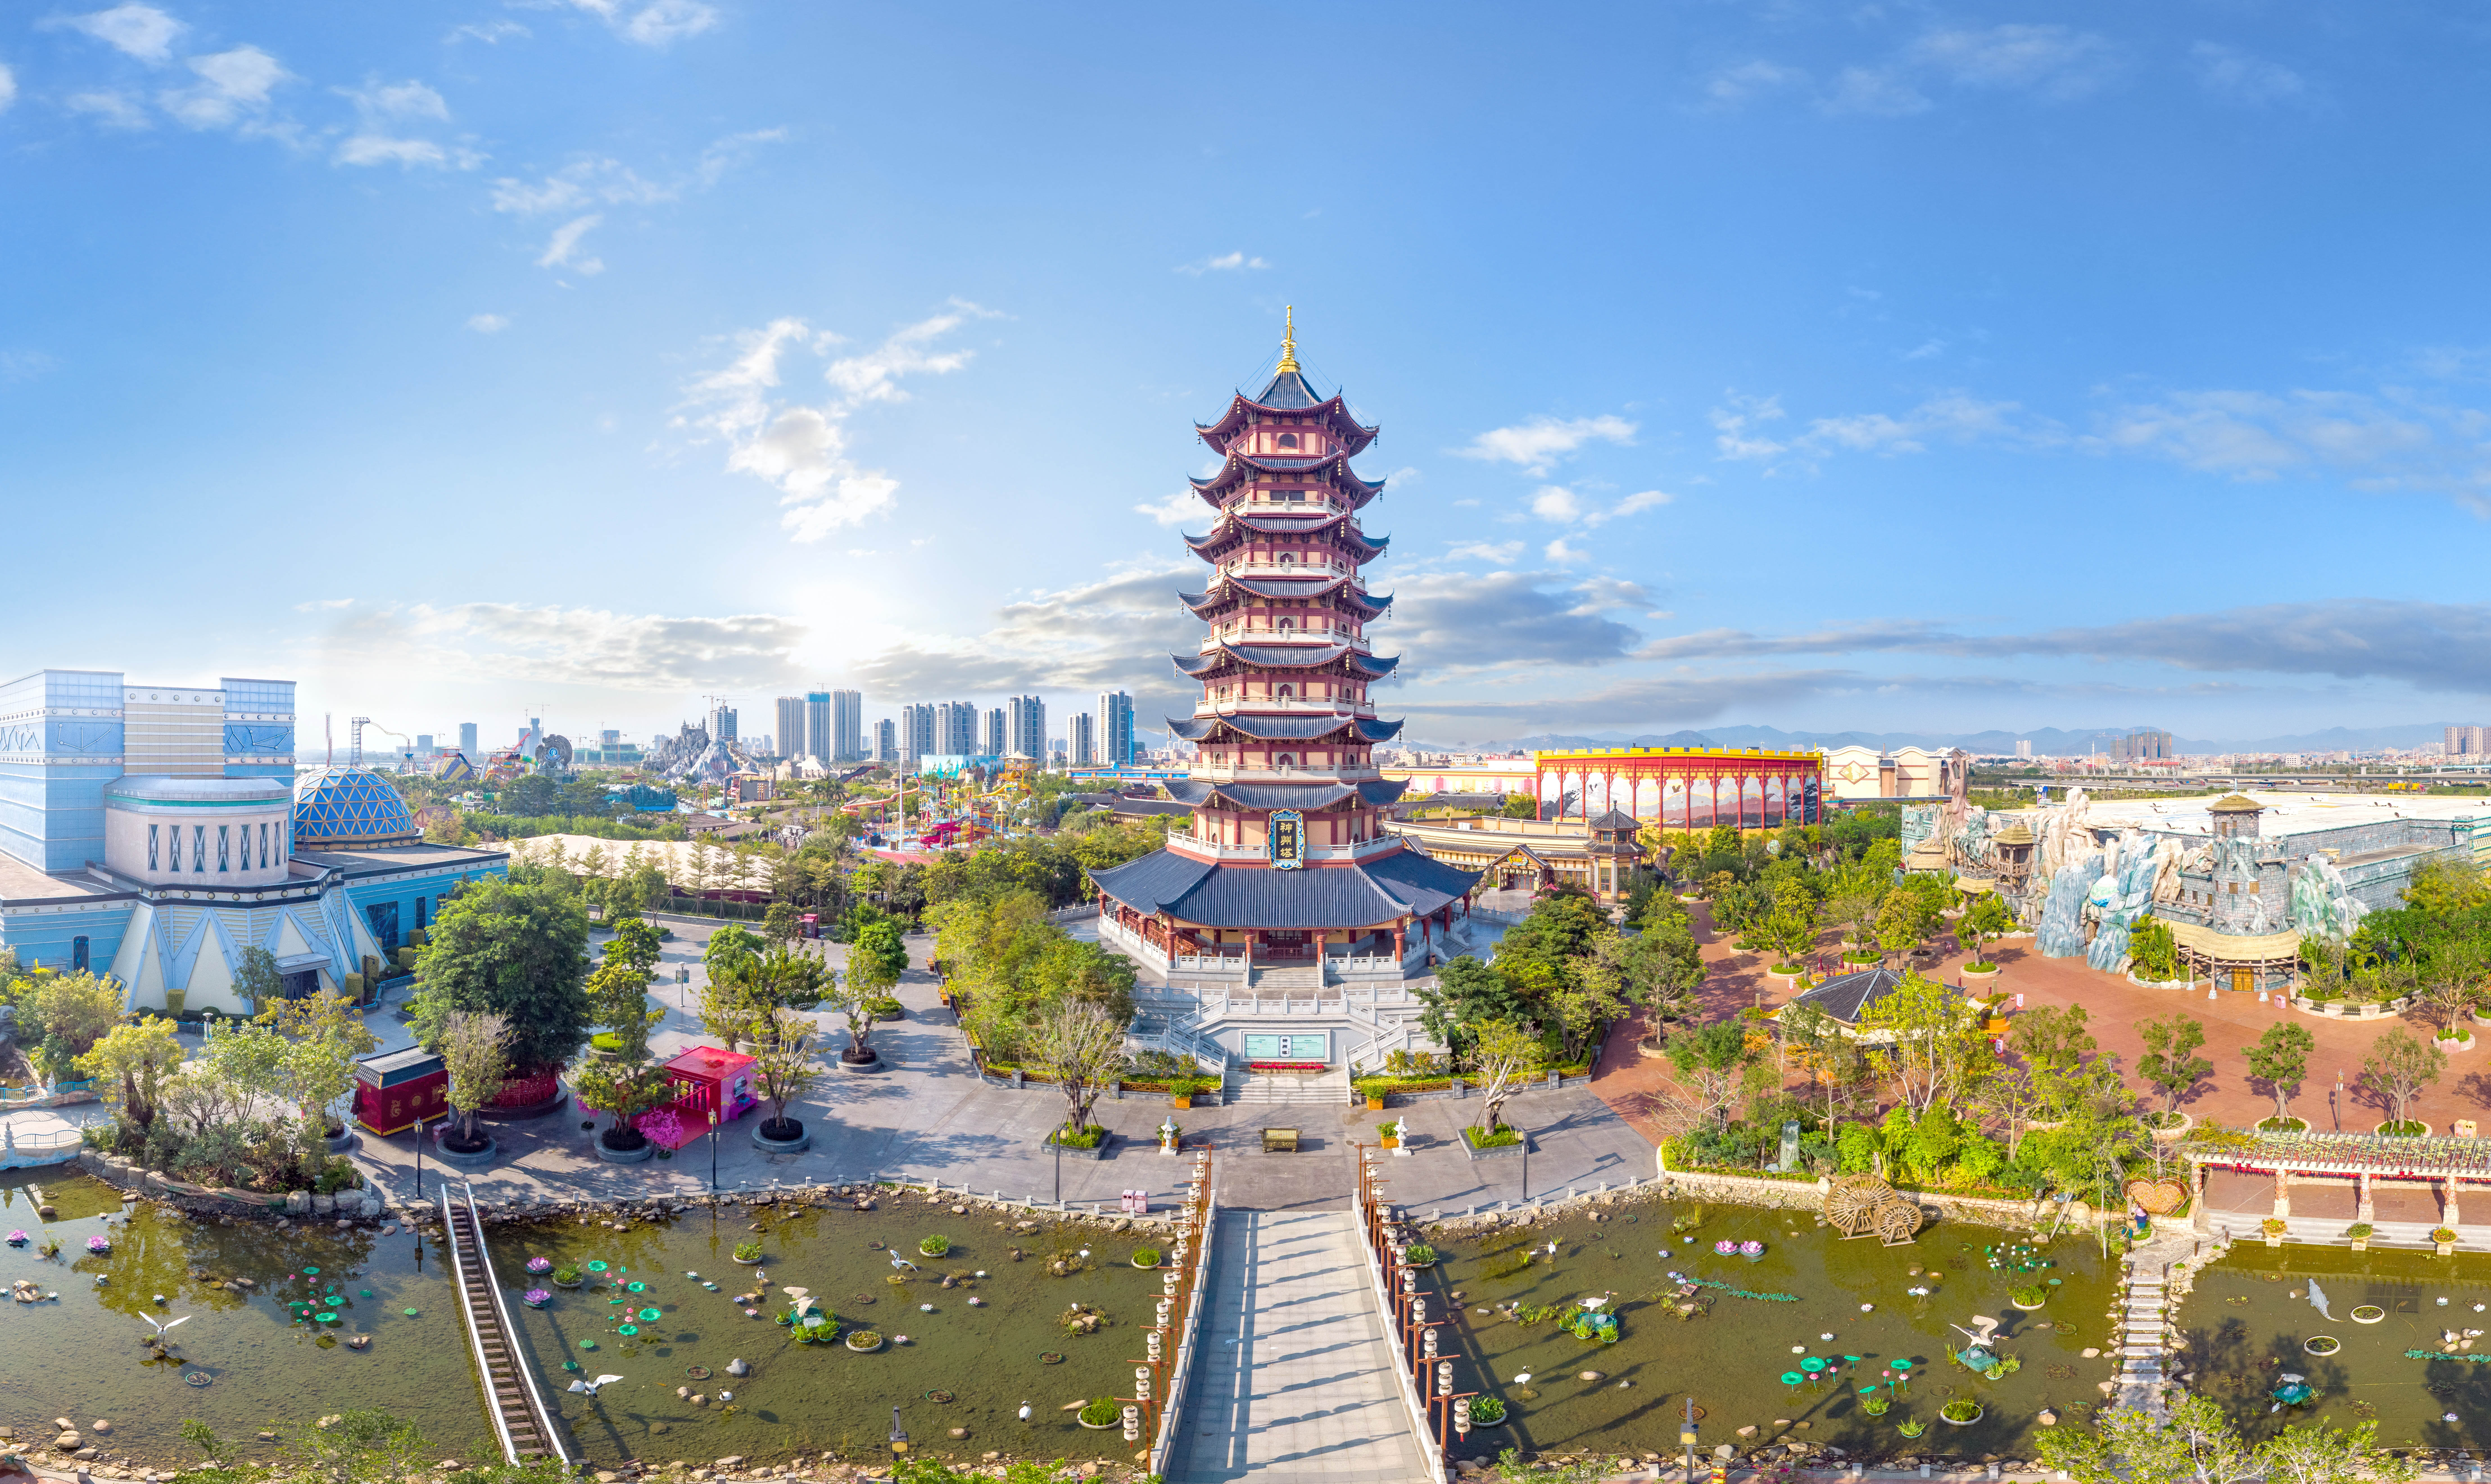 Xiamen Fantawild Oriental Heritage